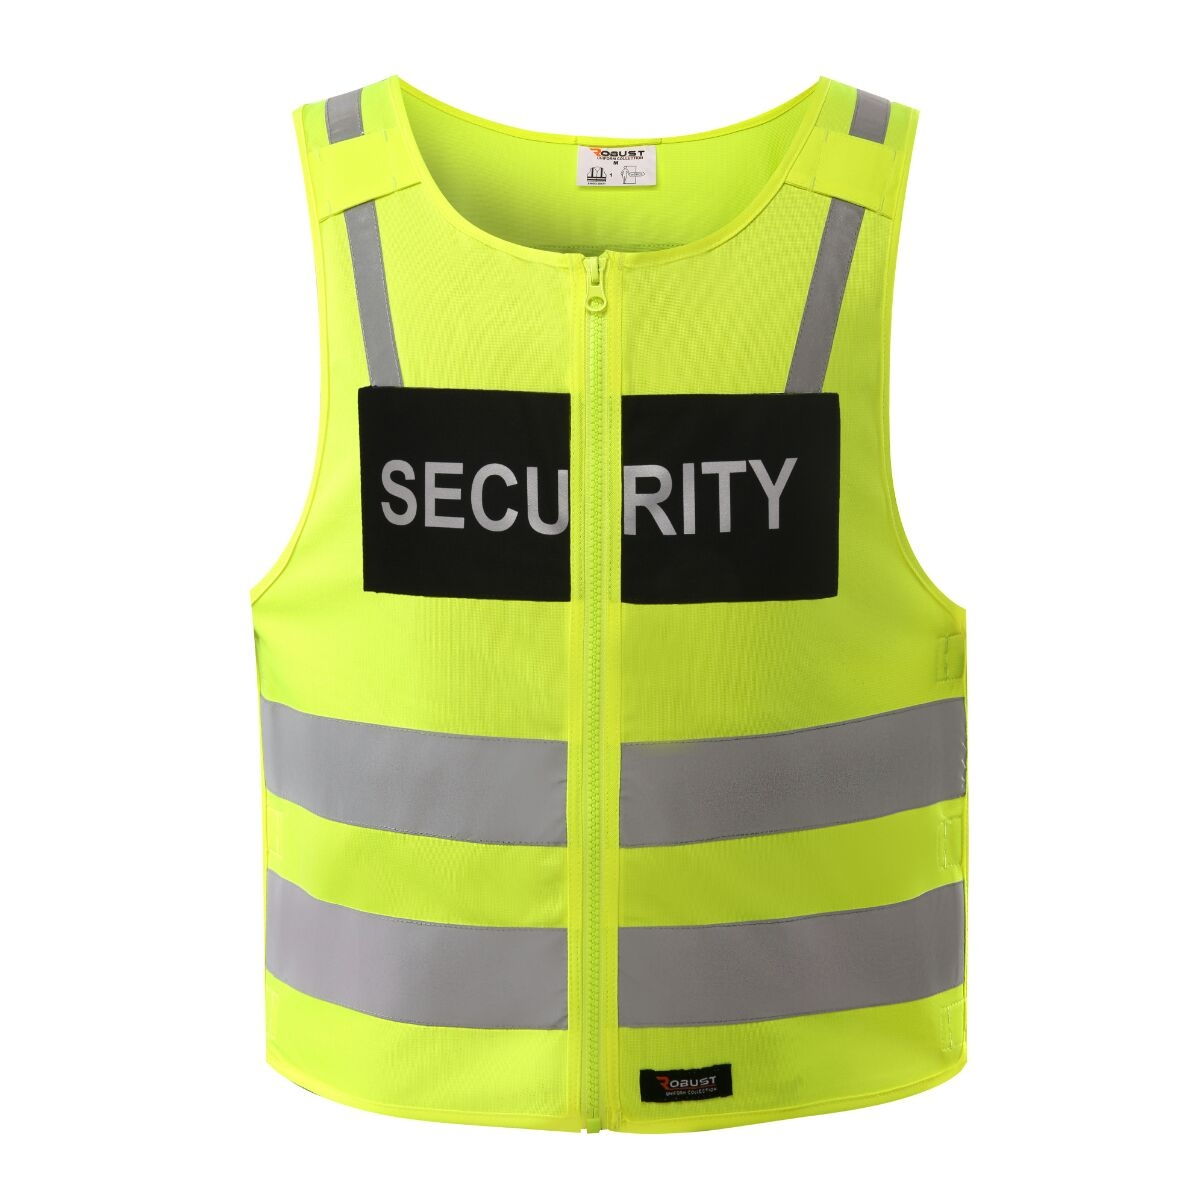 Entrèvärd / Security - VAKTBUTIKEN.SE